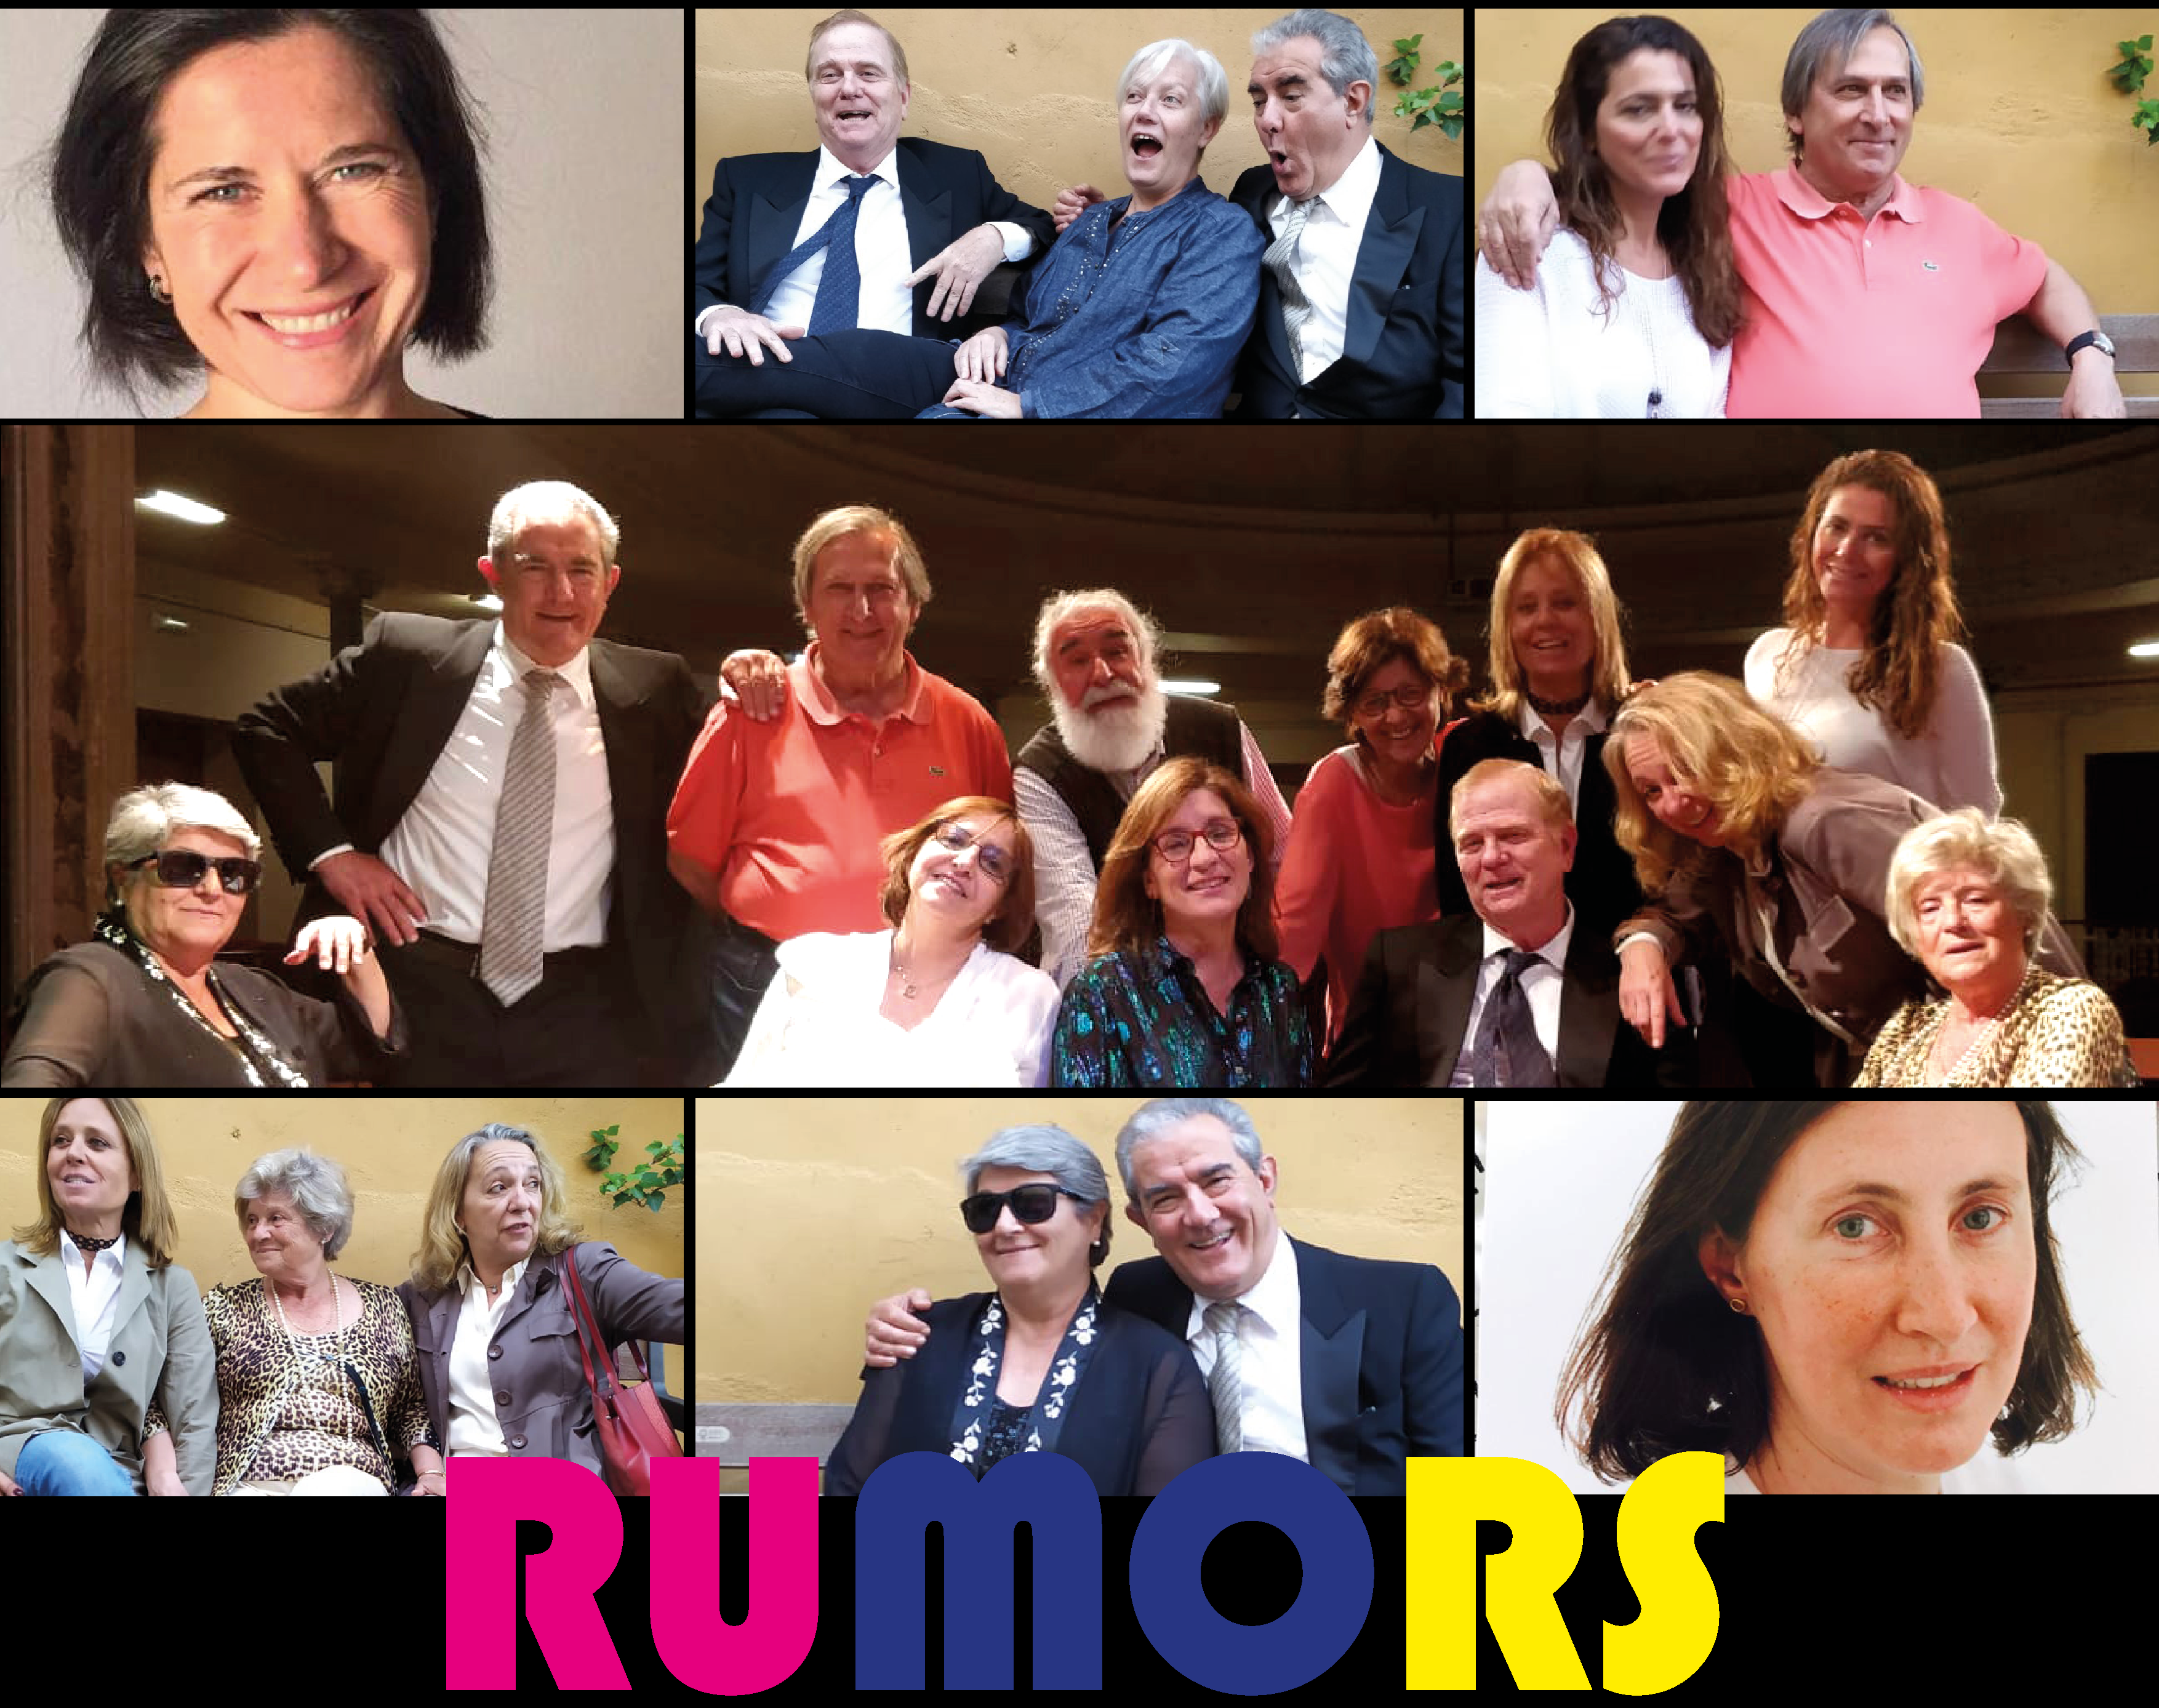 #teatredesdecasa: RUMORS, amb el grup de teatre 'Hi som tots?'/Teatregem